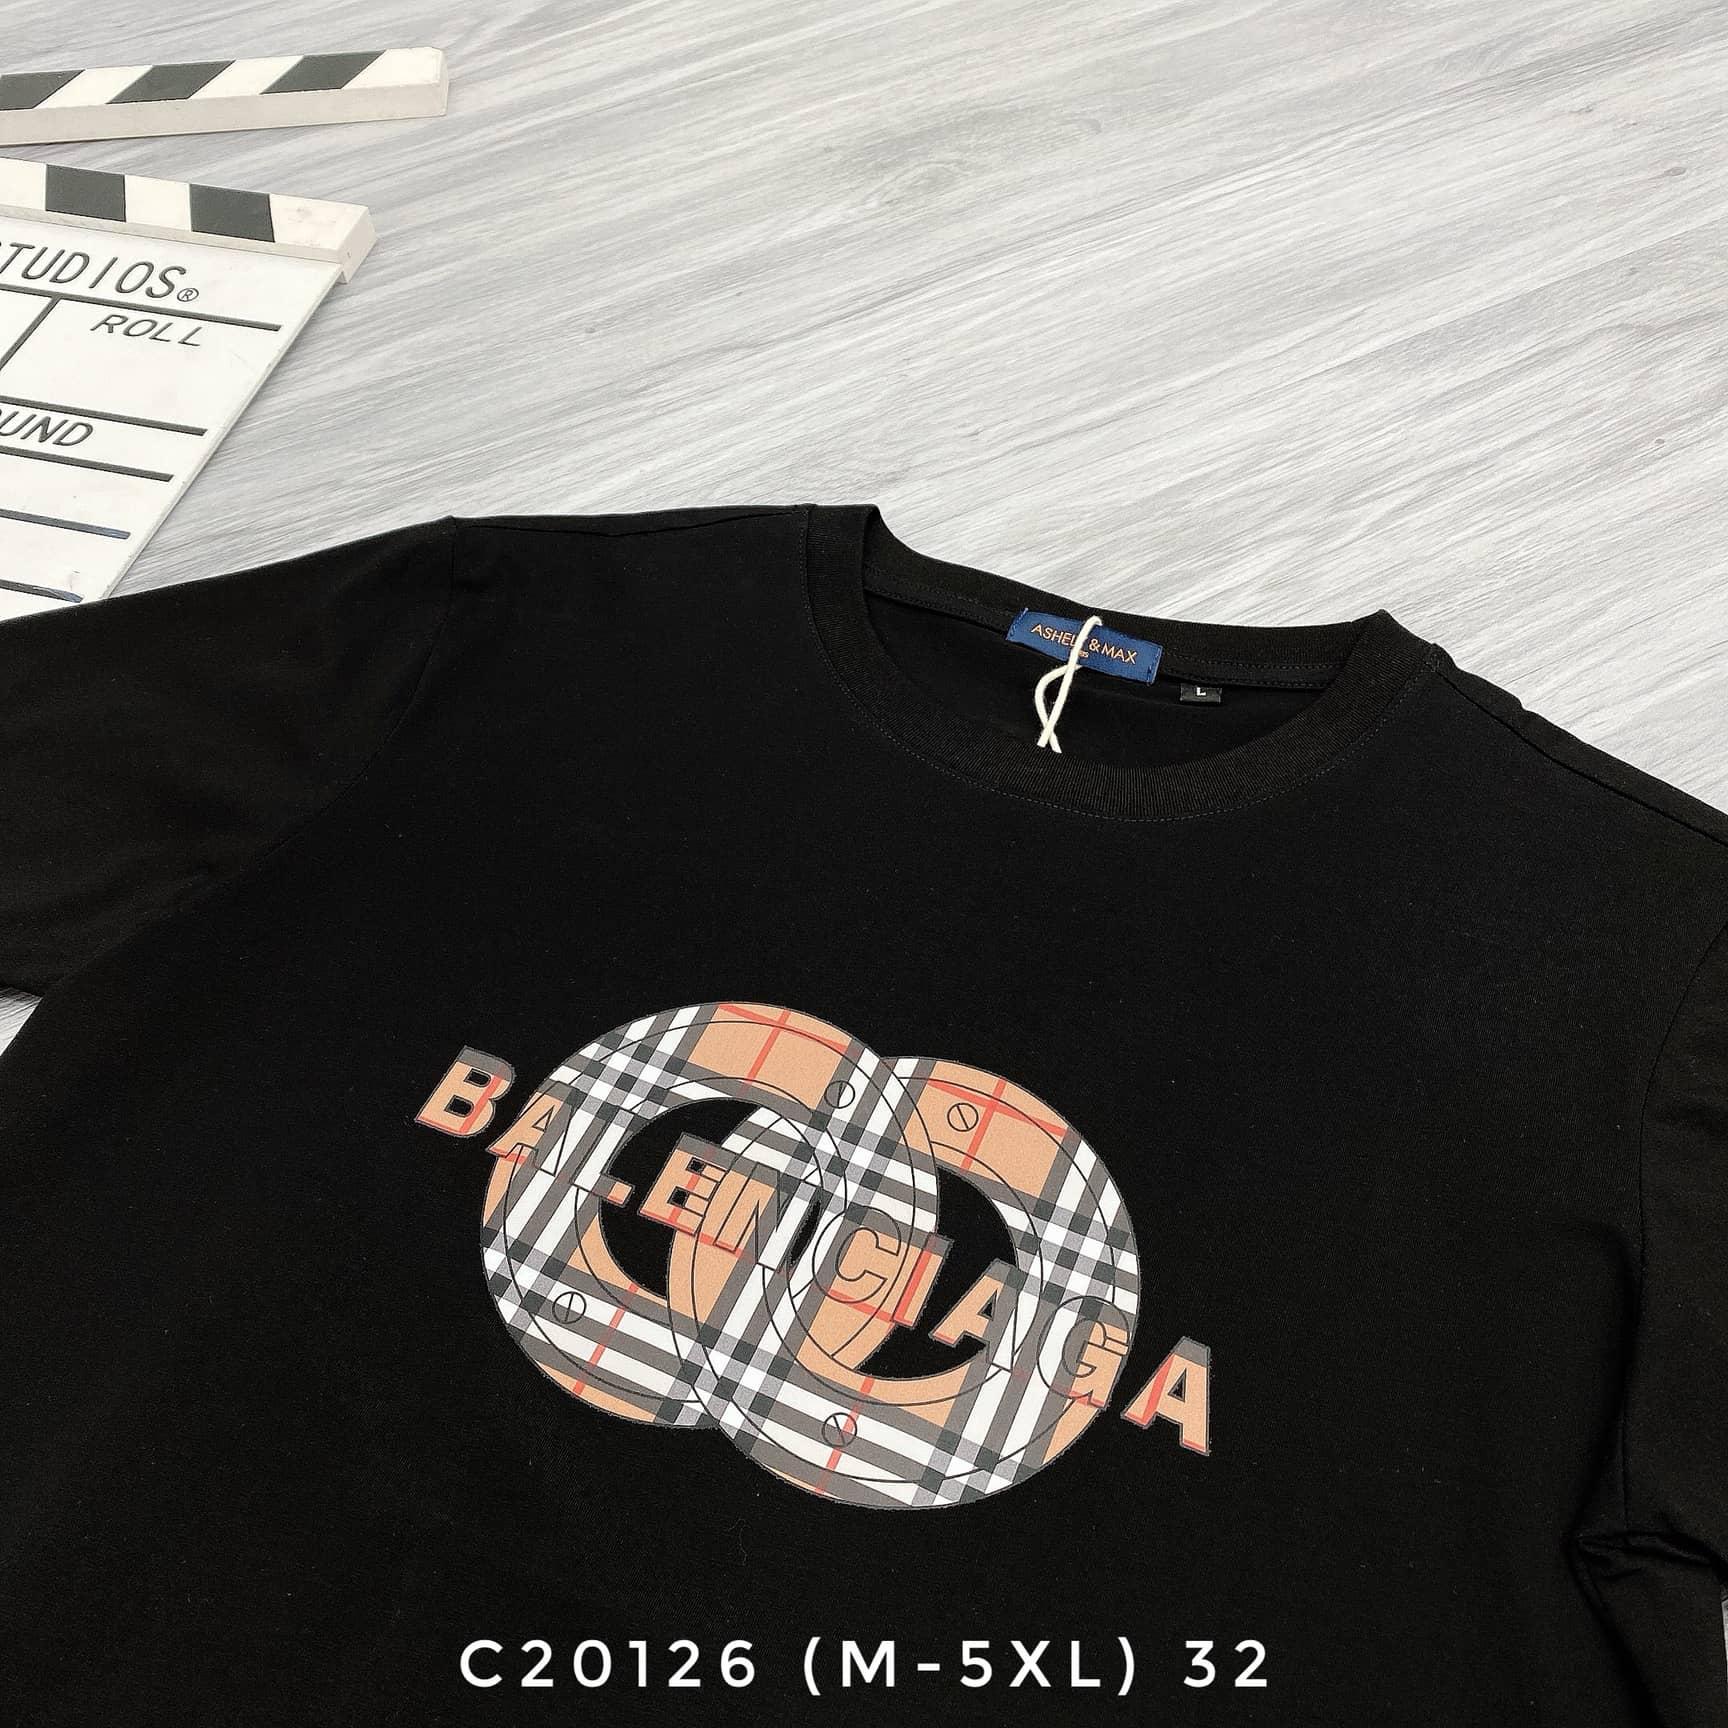 AT CỔ TRÒN C20126 (M-5XL)